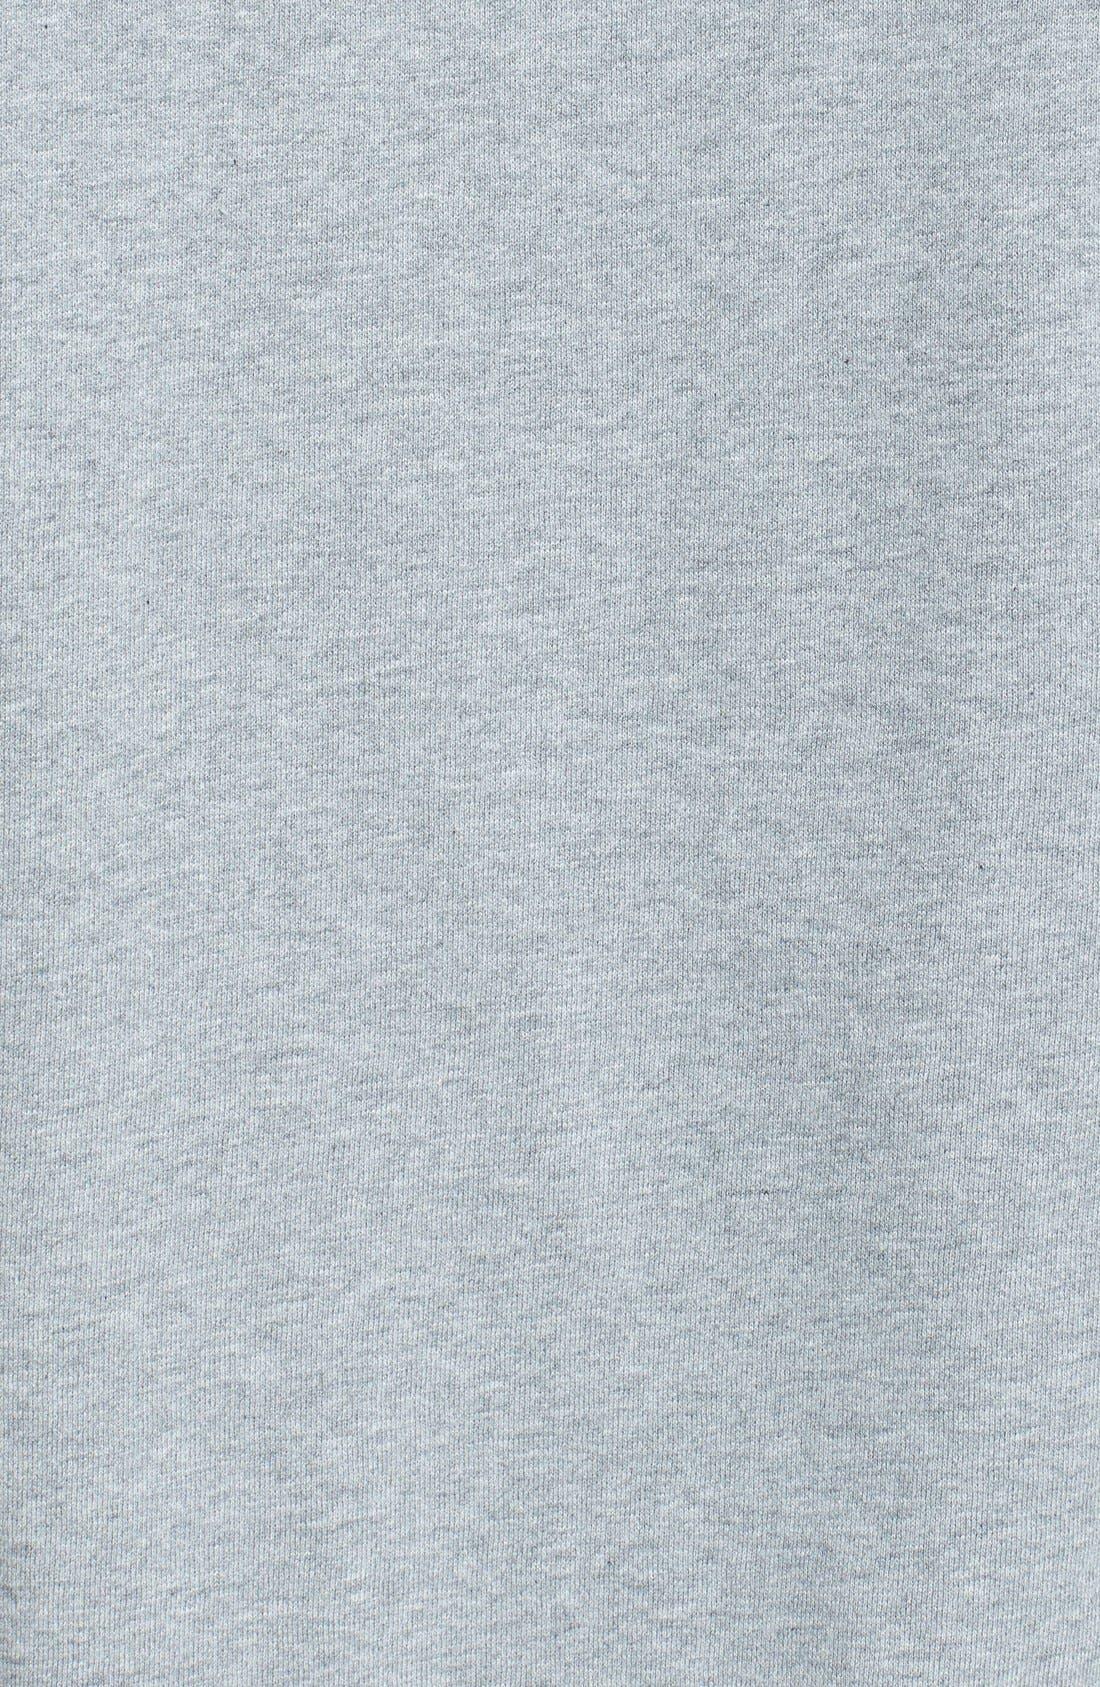 'Boston Red Sox' Crewneck Sweatshirt,                             Alternate thumbnail 2, color,                             061